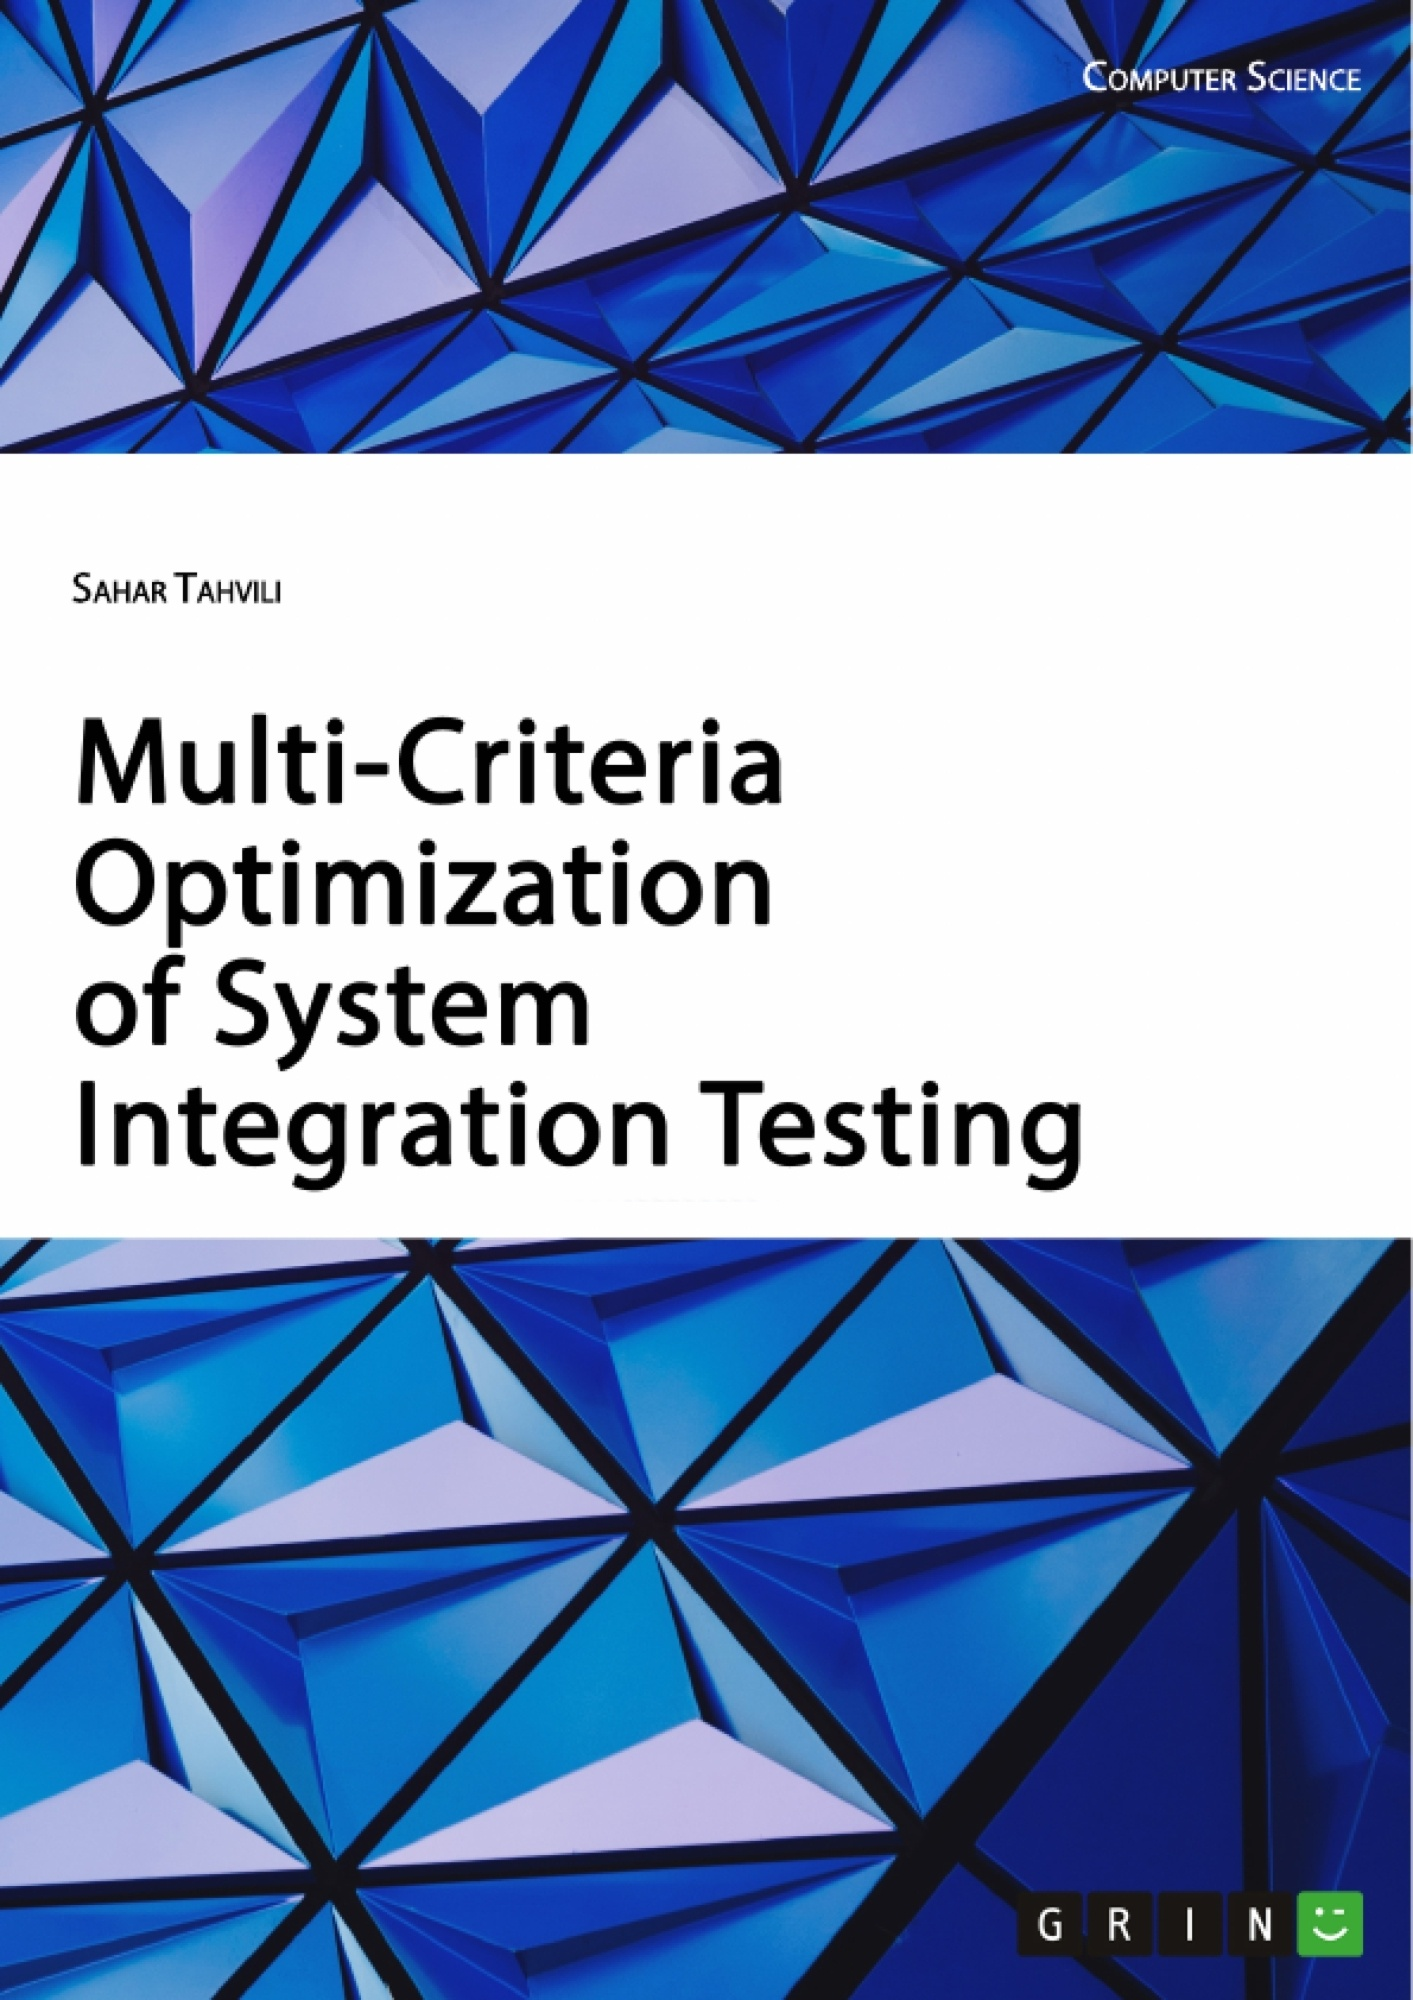 Title: Multi-Criteria Optimization of System Integration Testing